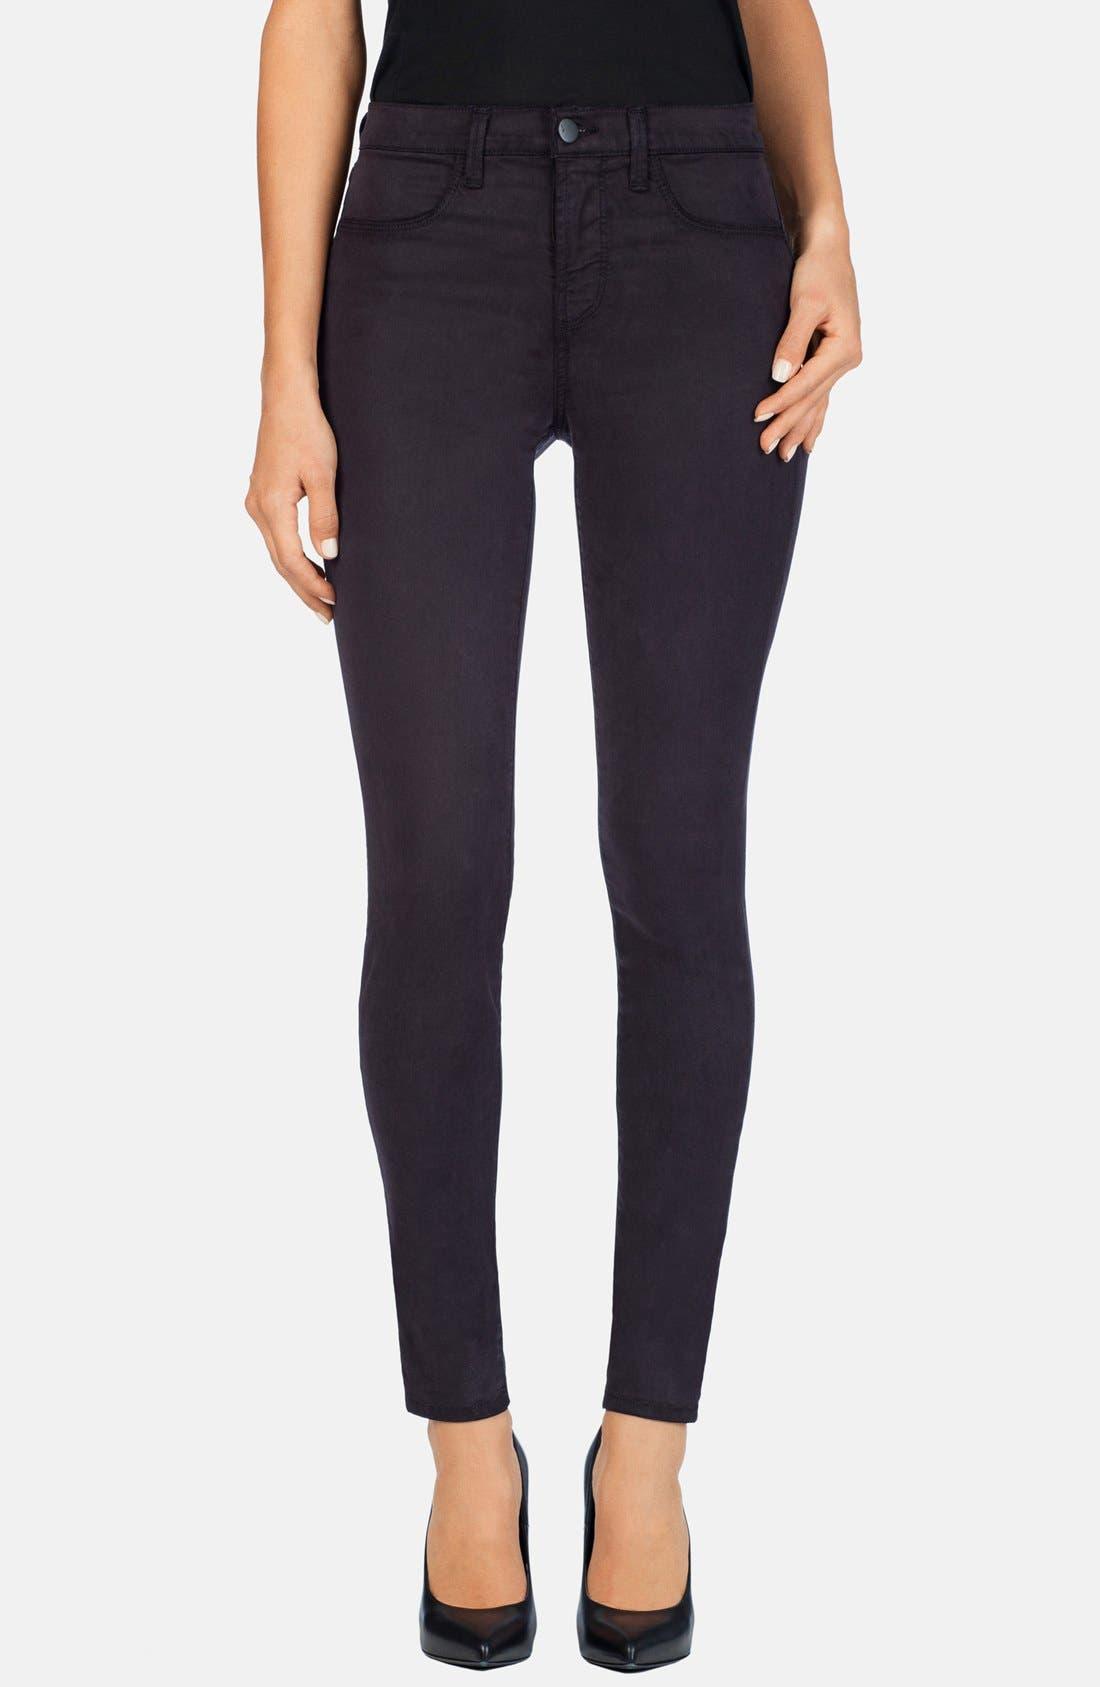 Alternate Image 1 Selected - J Brand '485' Mid Rise Super Skinny Jeans